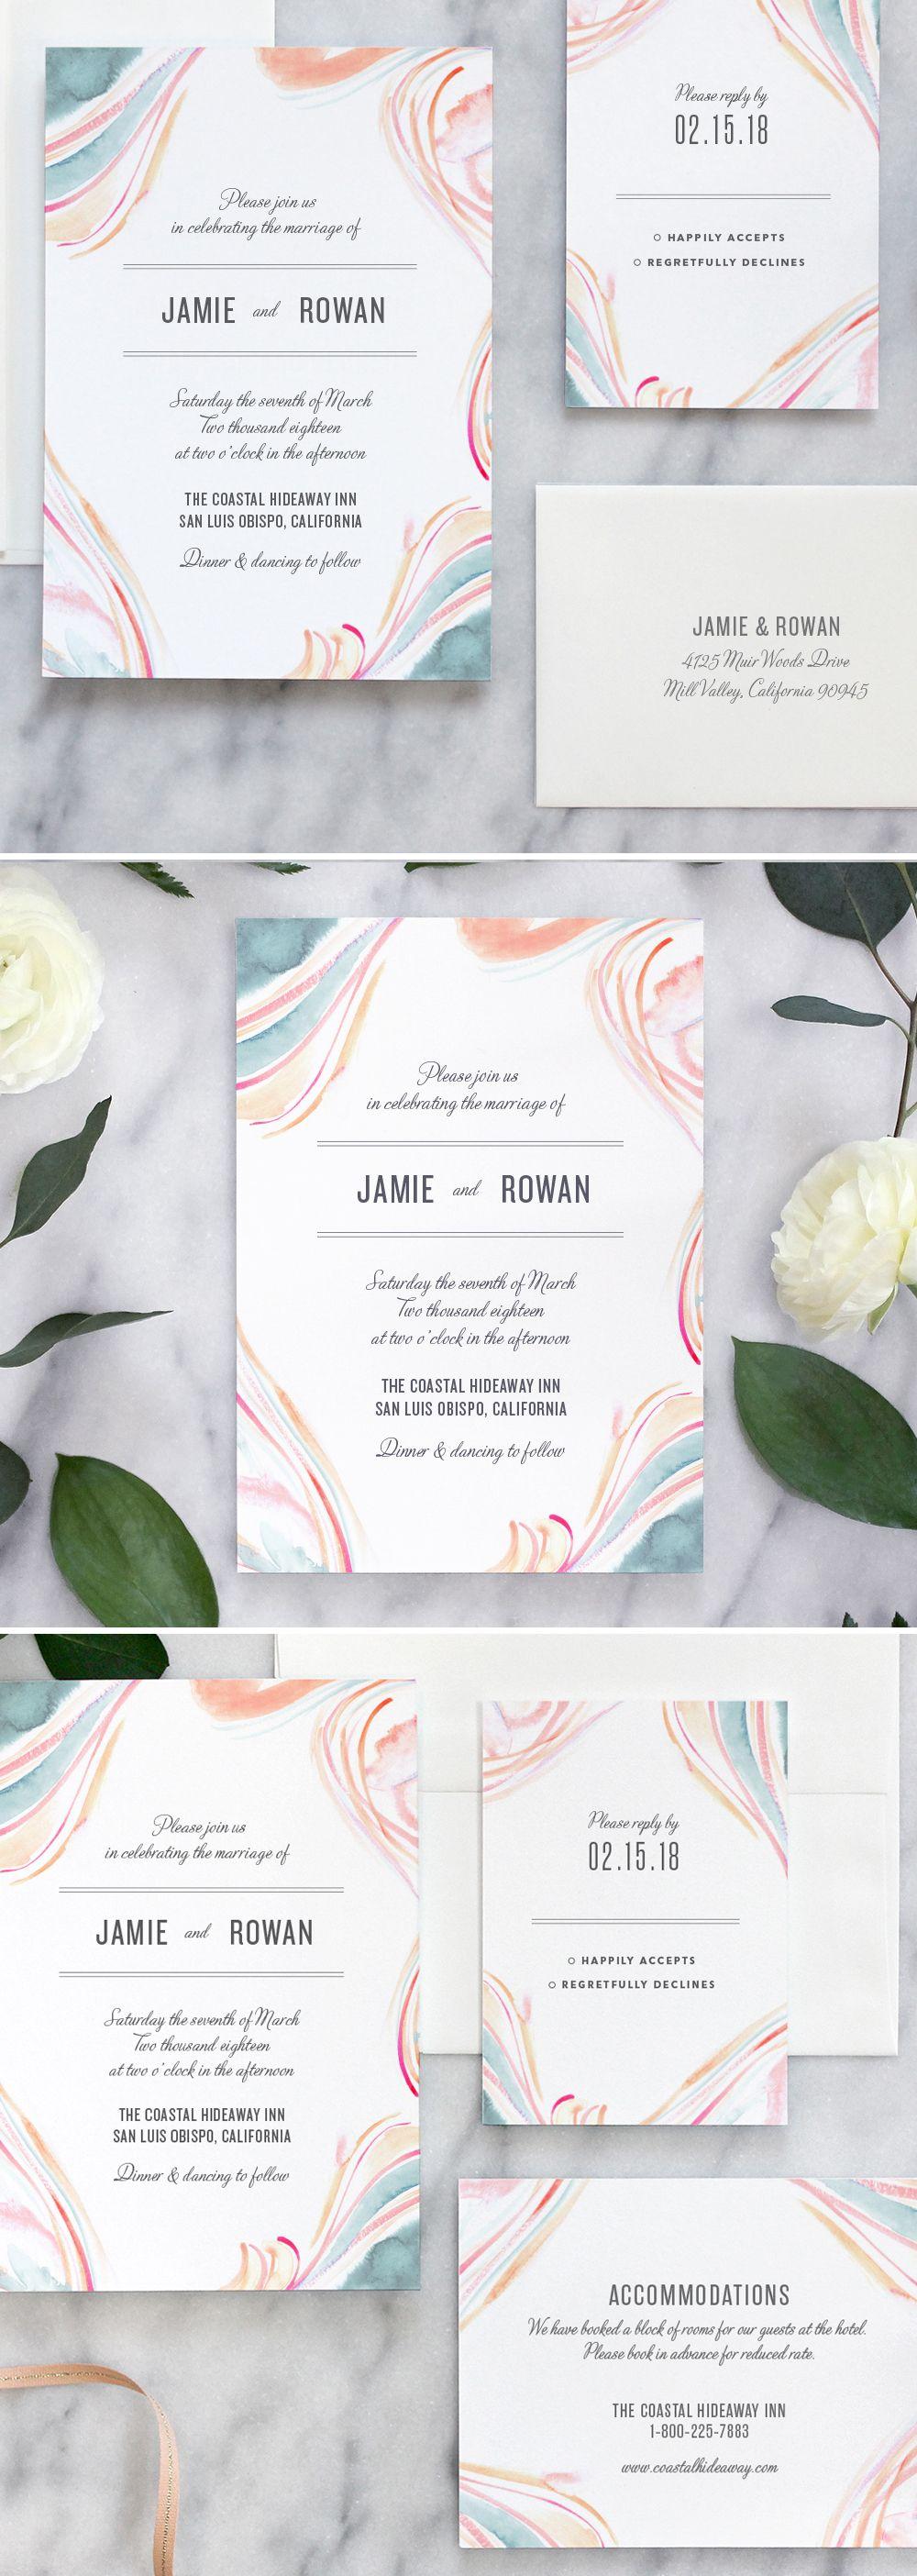 Marble Watercolor Wedding Invitations: Pastel   Marbles, Watercolor ...